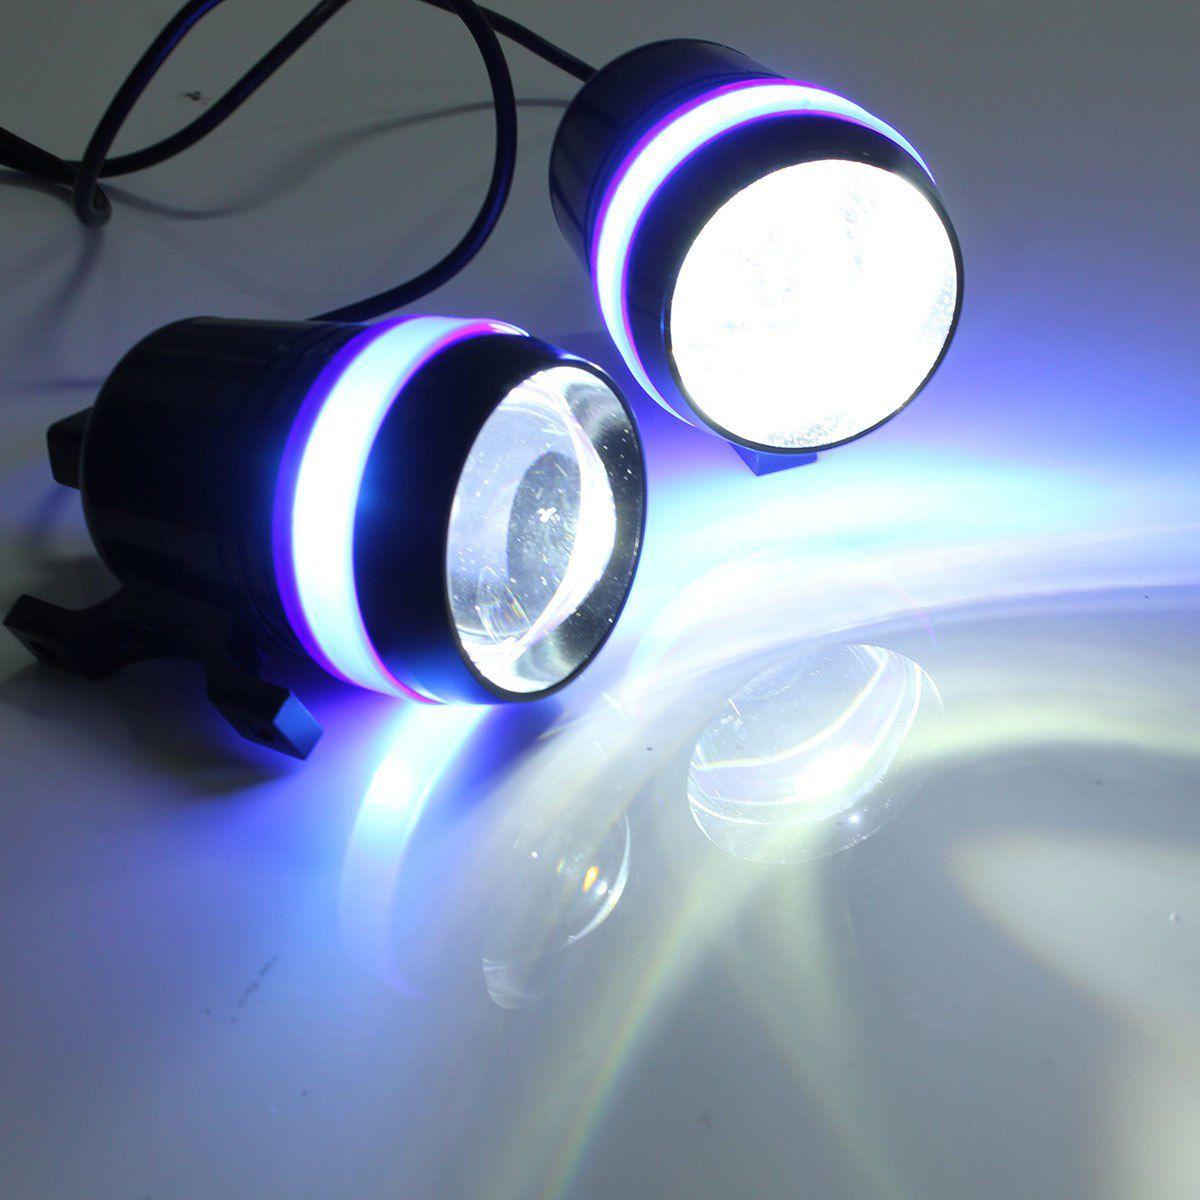 2 Farol Milha Projetor U3 lâmpada led angel Azul Strobo Moto